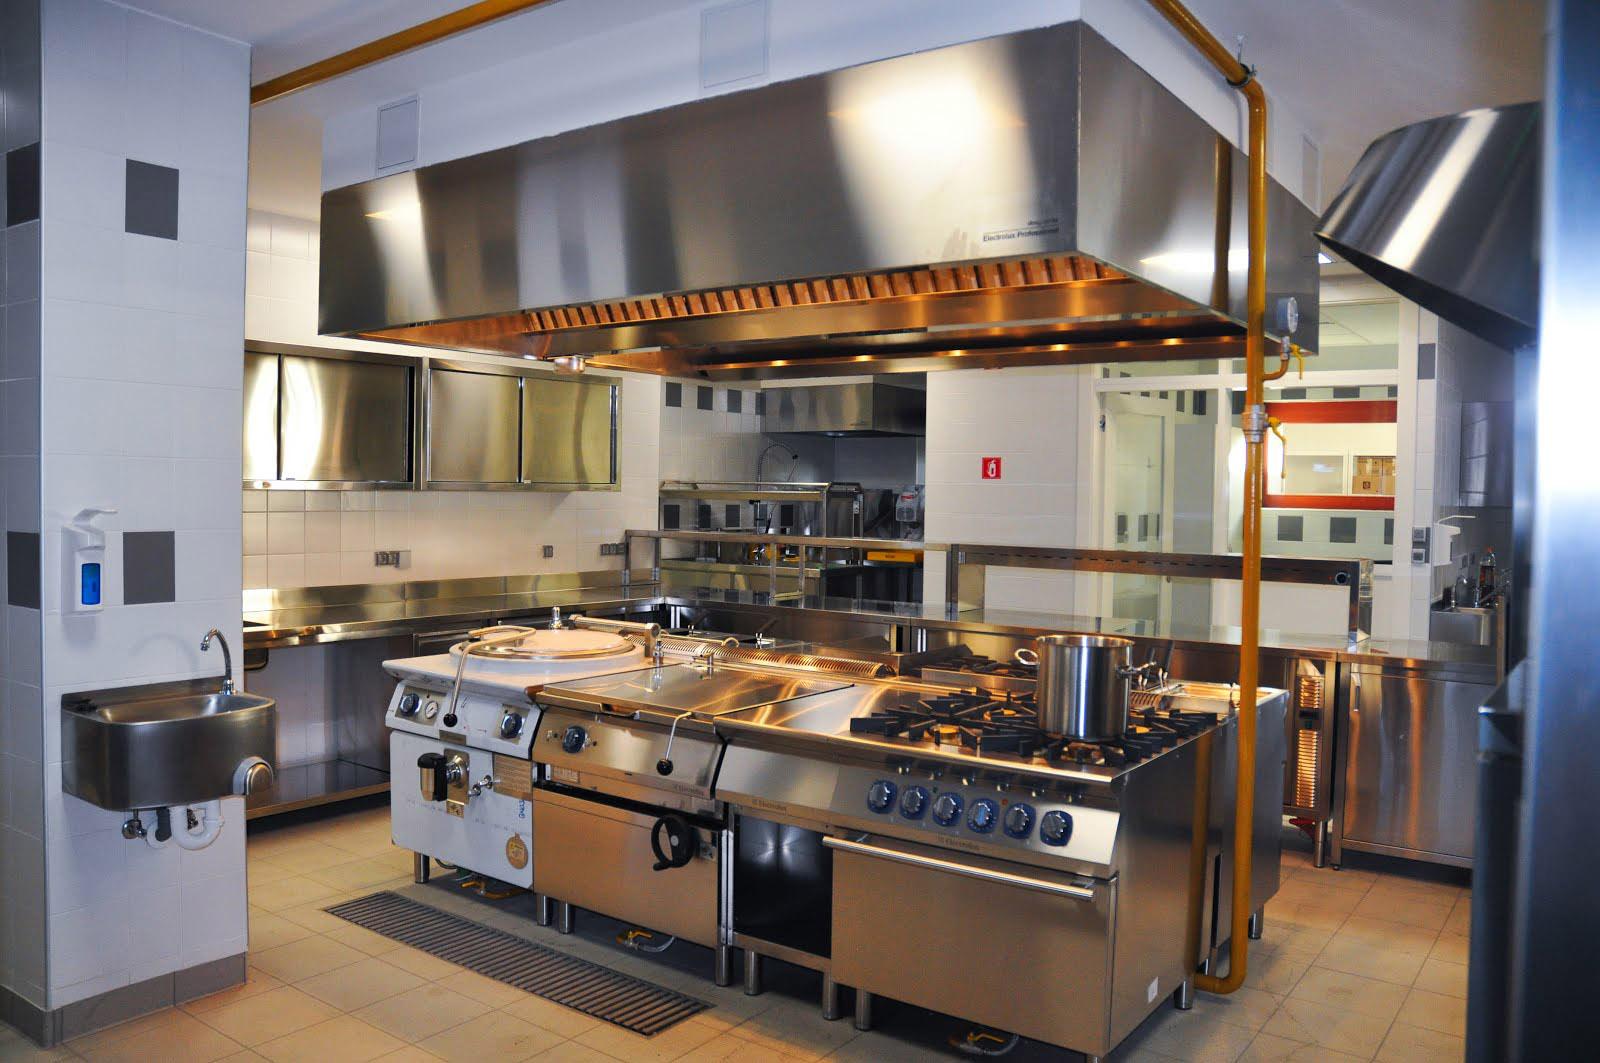 Kuhinja doma za umirovljenike